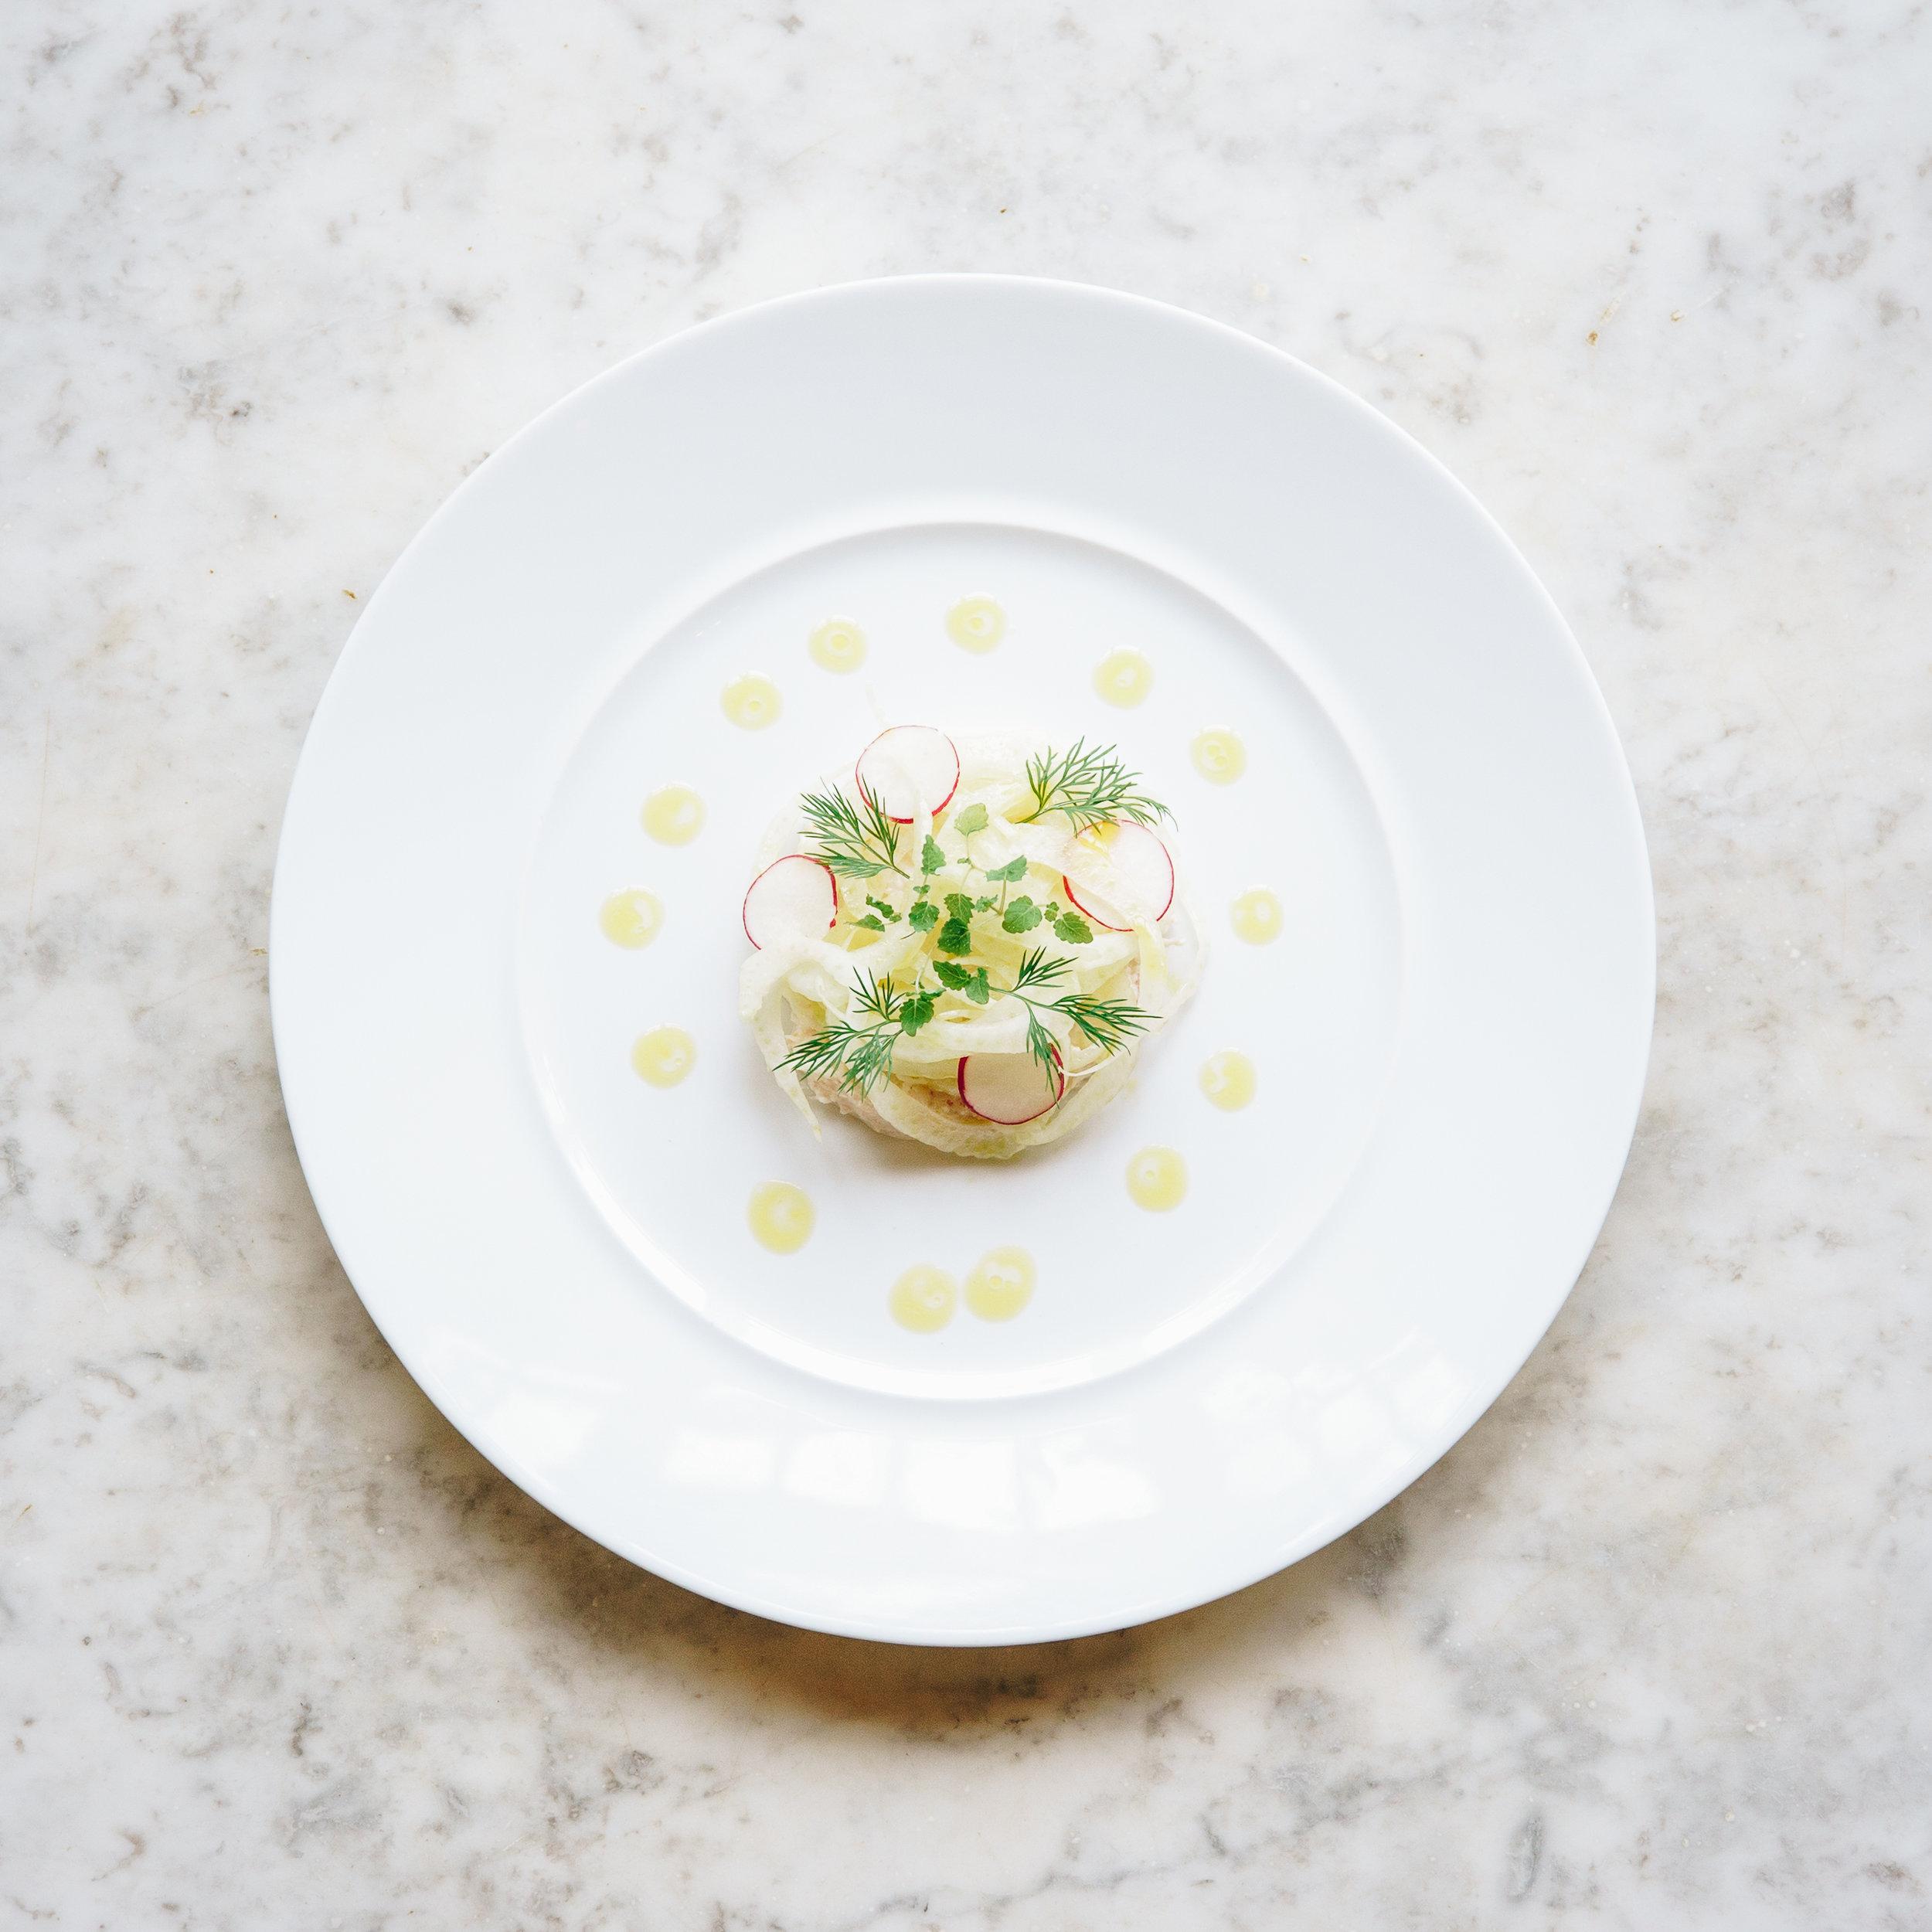 Gluten Free_Crab Salad_SQ-06958.jpg